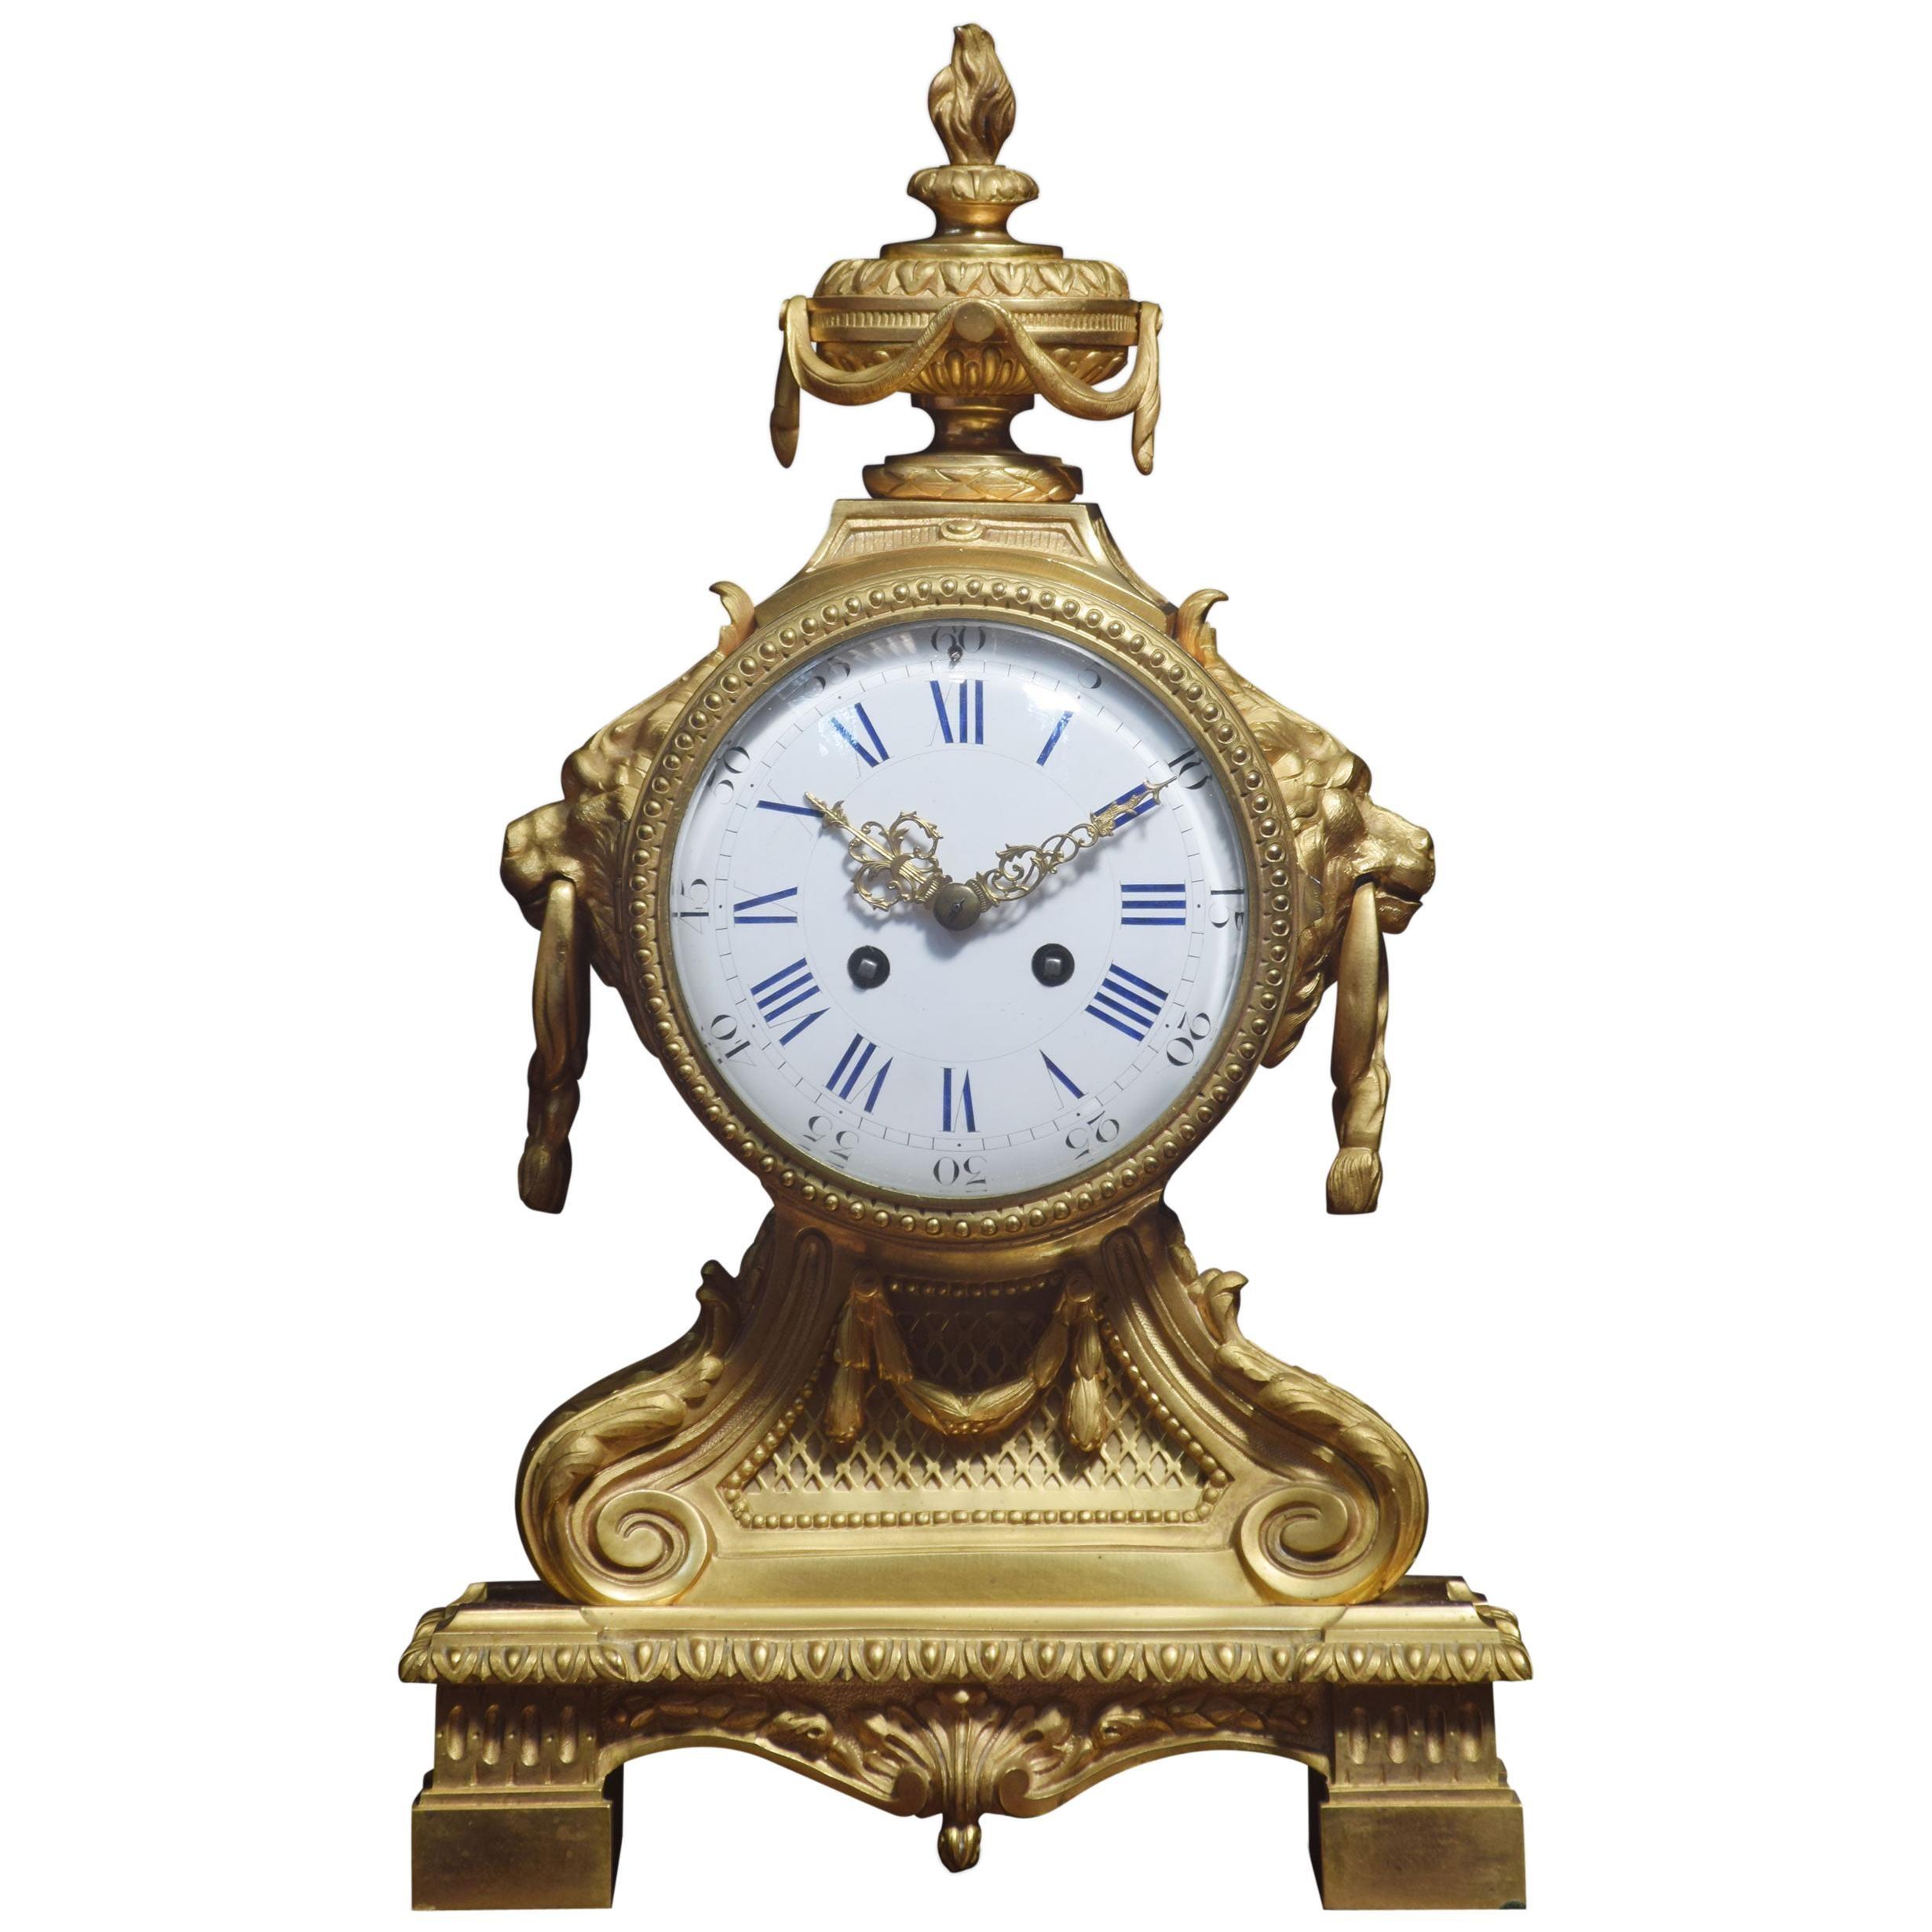 Late 19th Century French Gilt Metal Mantel Clock